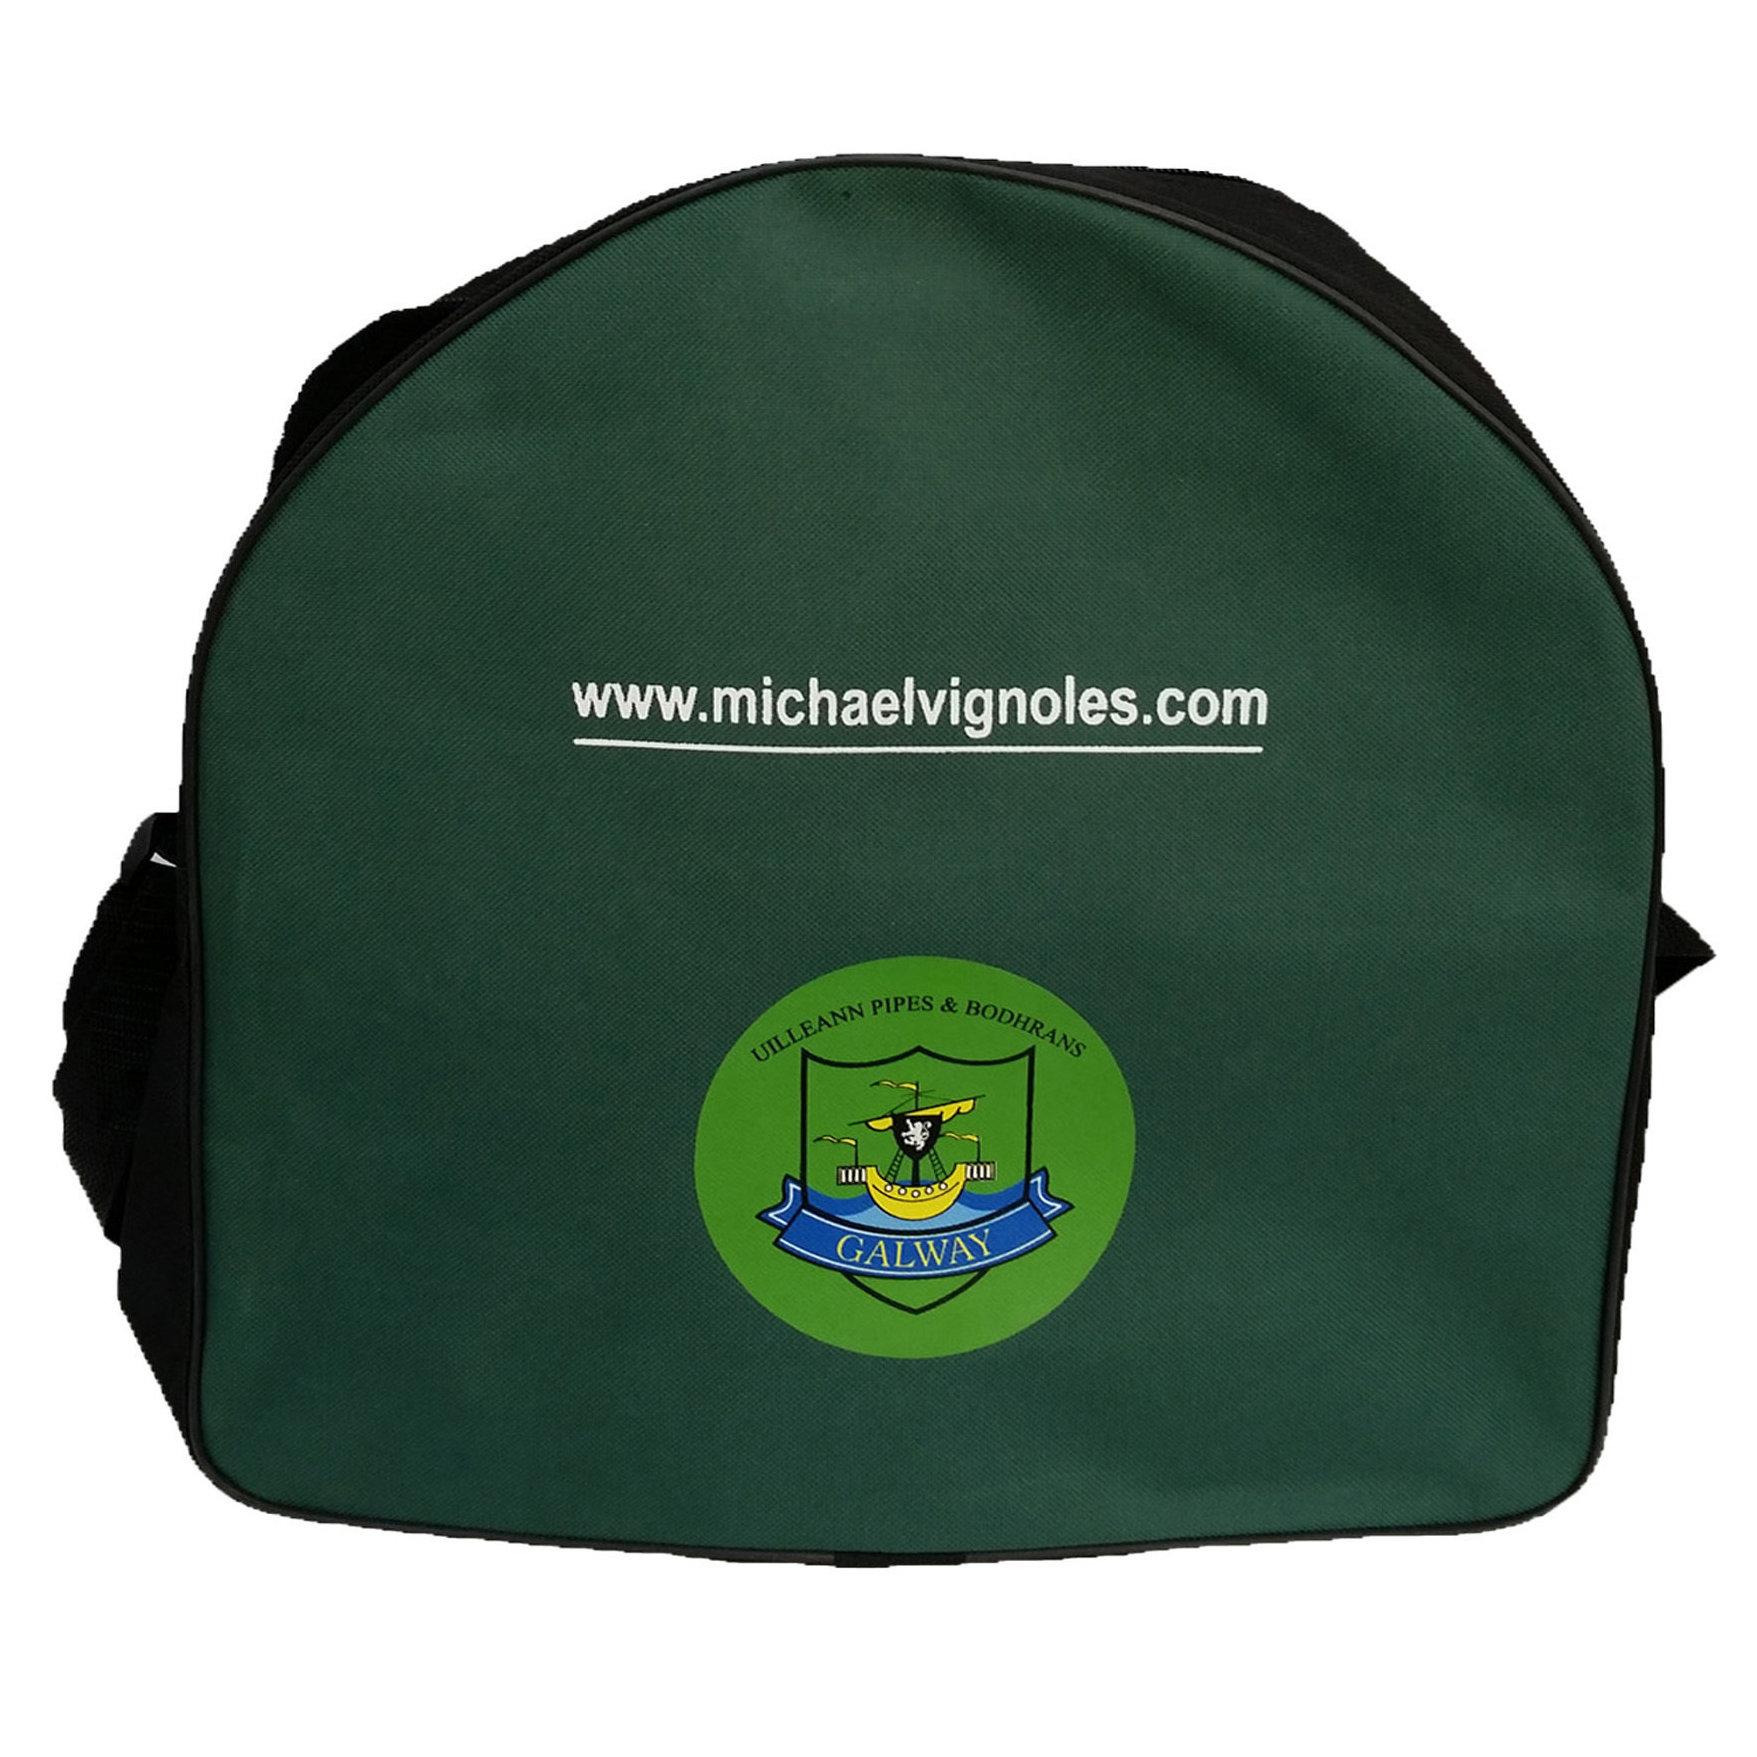 16-inch Bodhran Carry Case CC16